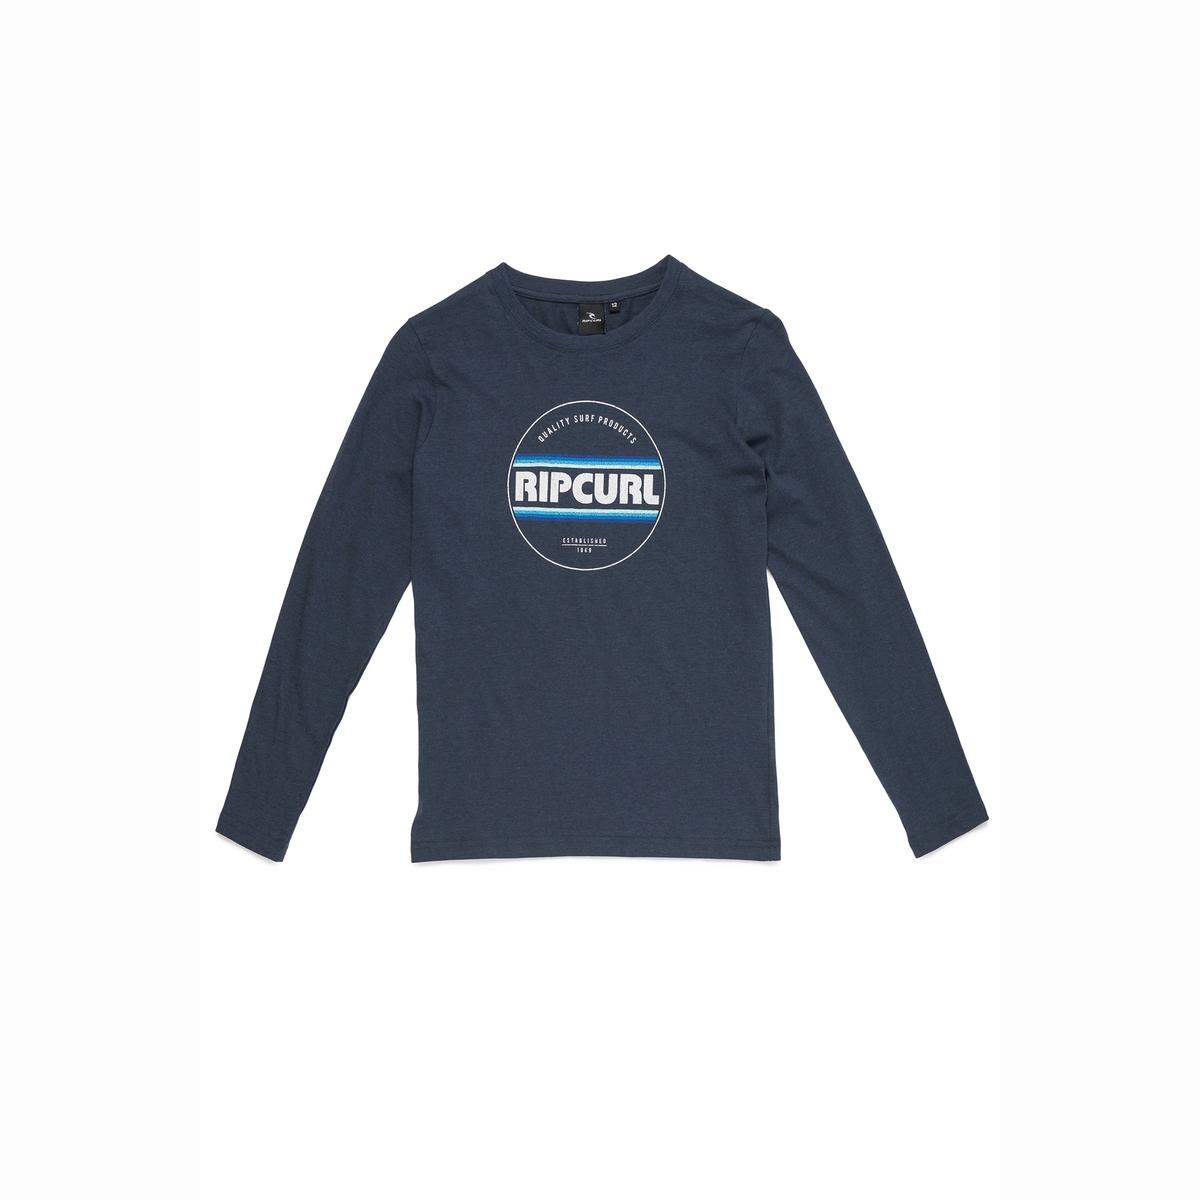 Футболка с длинными рукавами, 8-16 лет футболка rip curl футболка artee ss tee